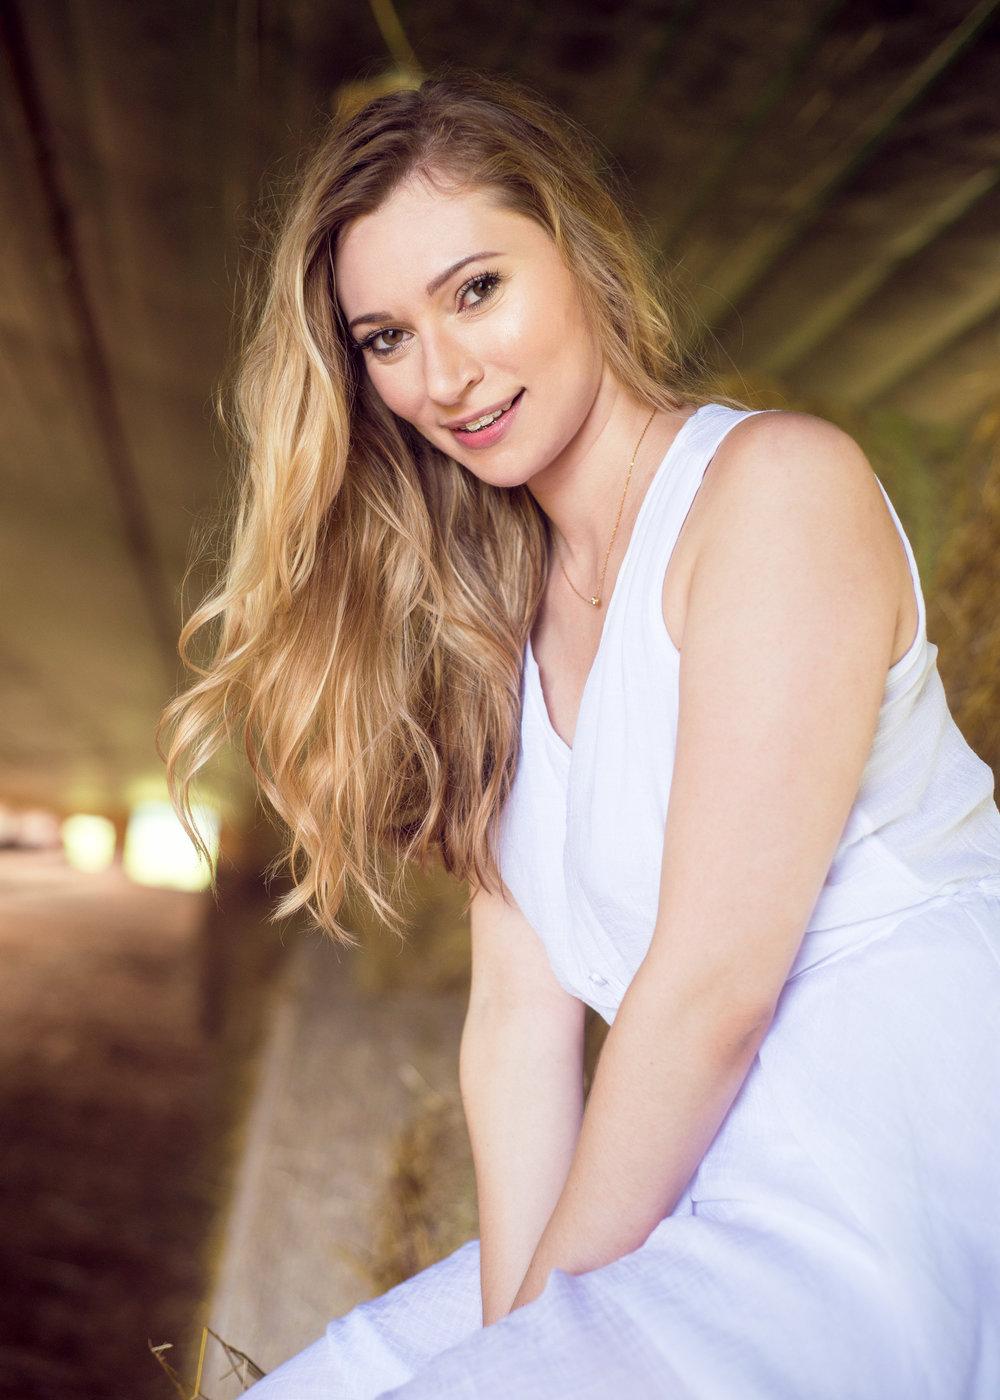 Model: Elizabeth Lenz